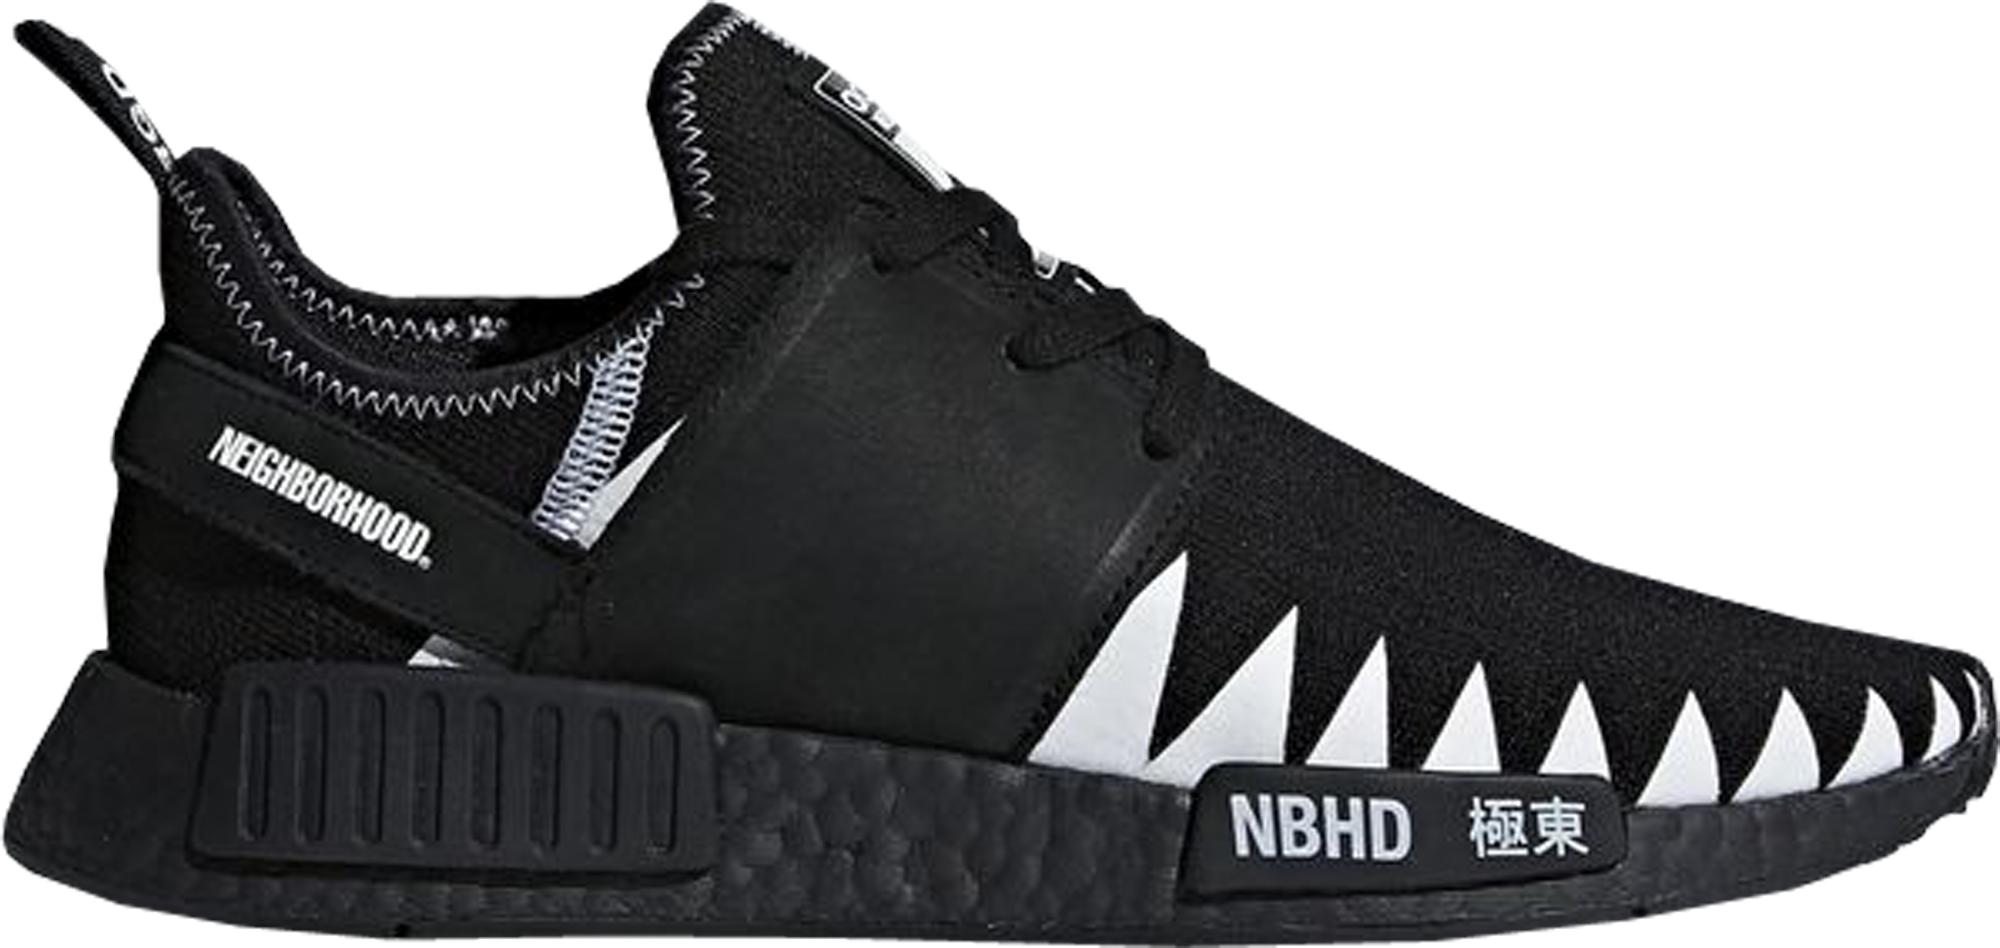 Comprare Scarpe Adidas Nmd Vive. Dimensioni 6 & Scorte Vive. Nmd dddbe4